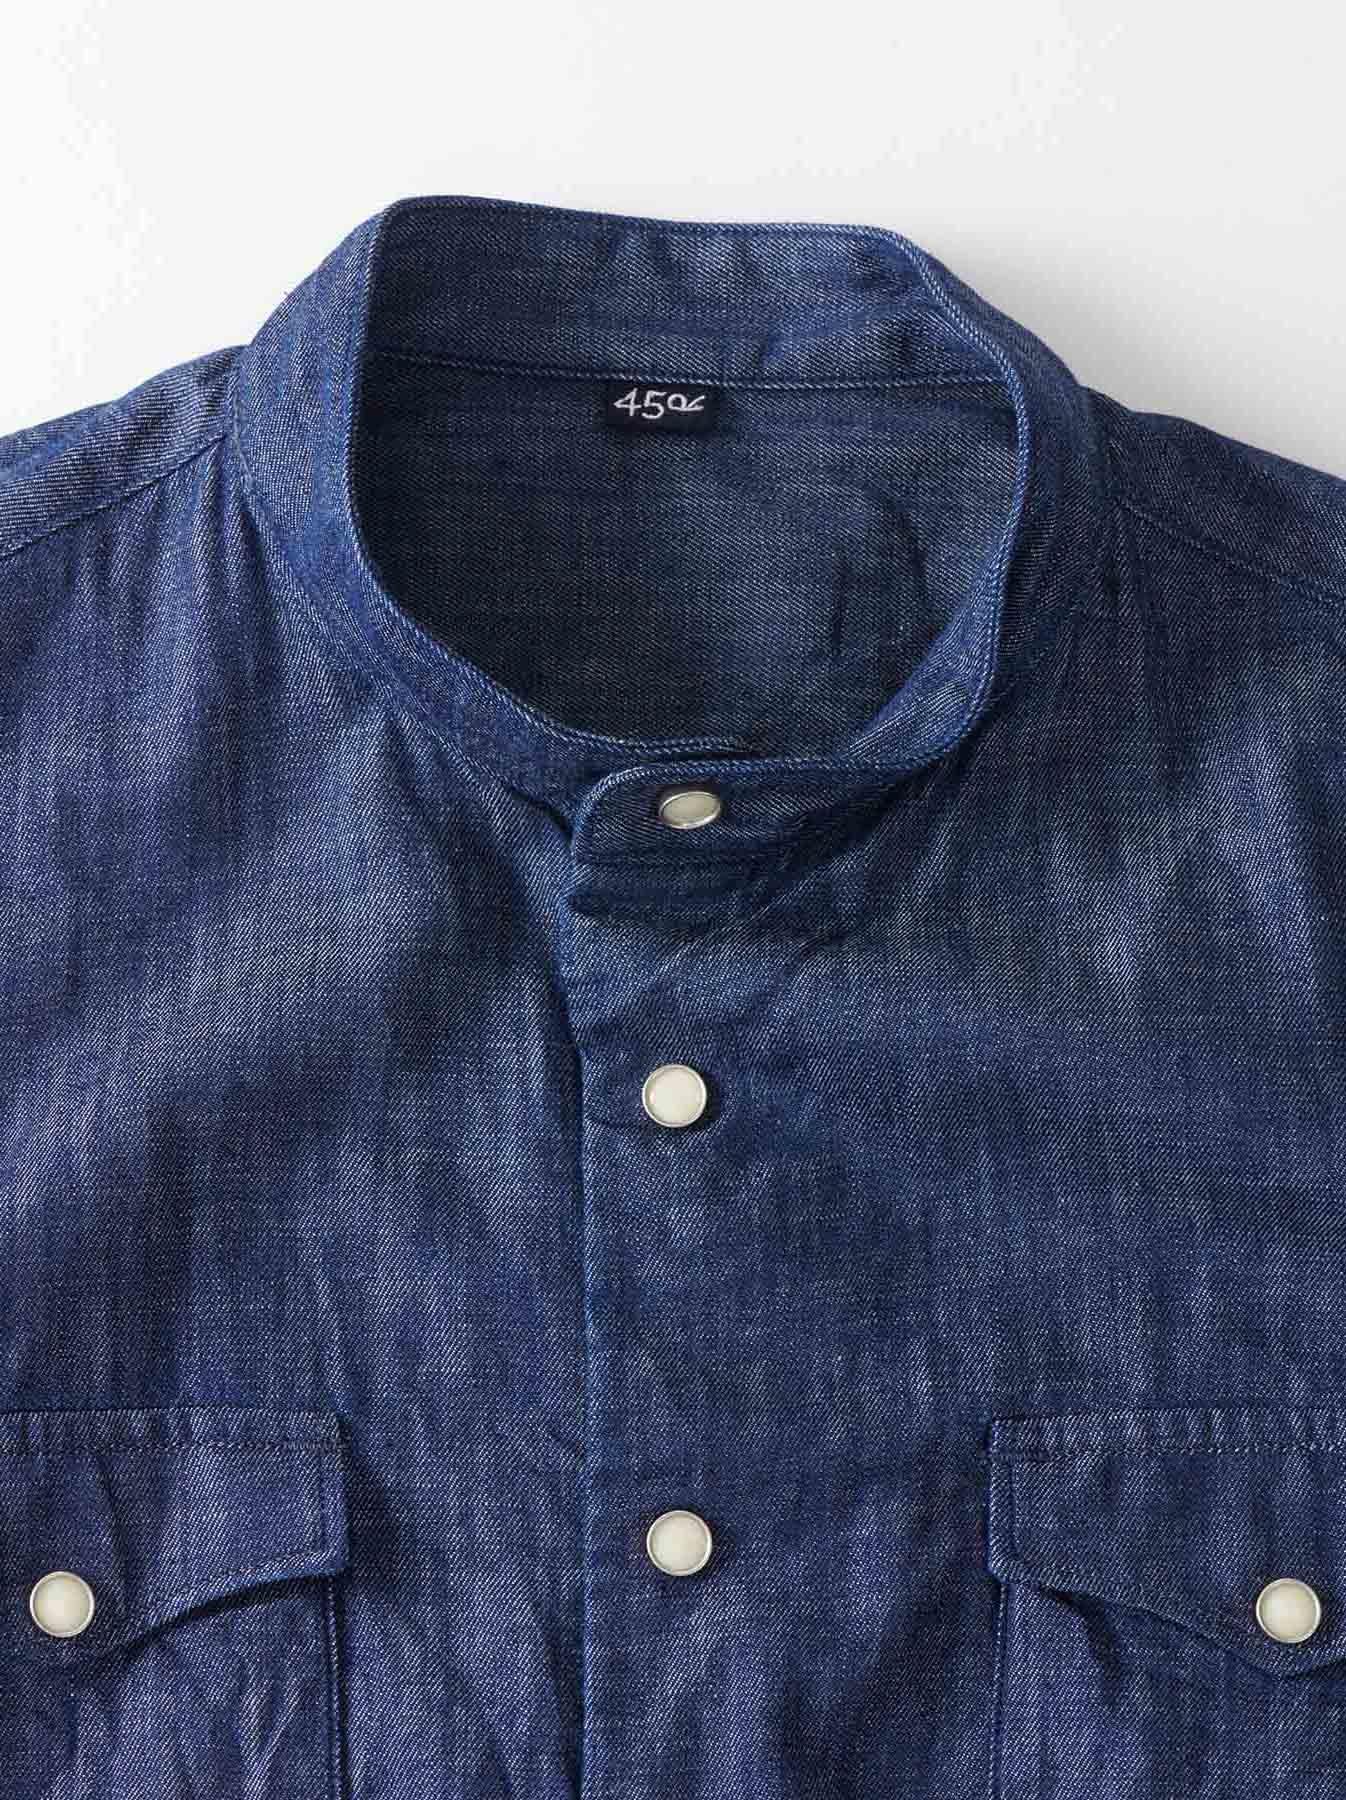 Goma Denim Stand Collar Eastern Shirt-6